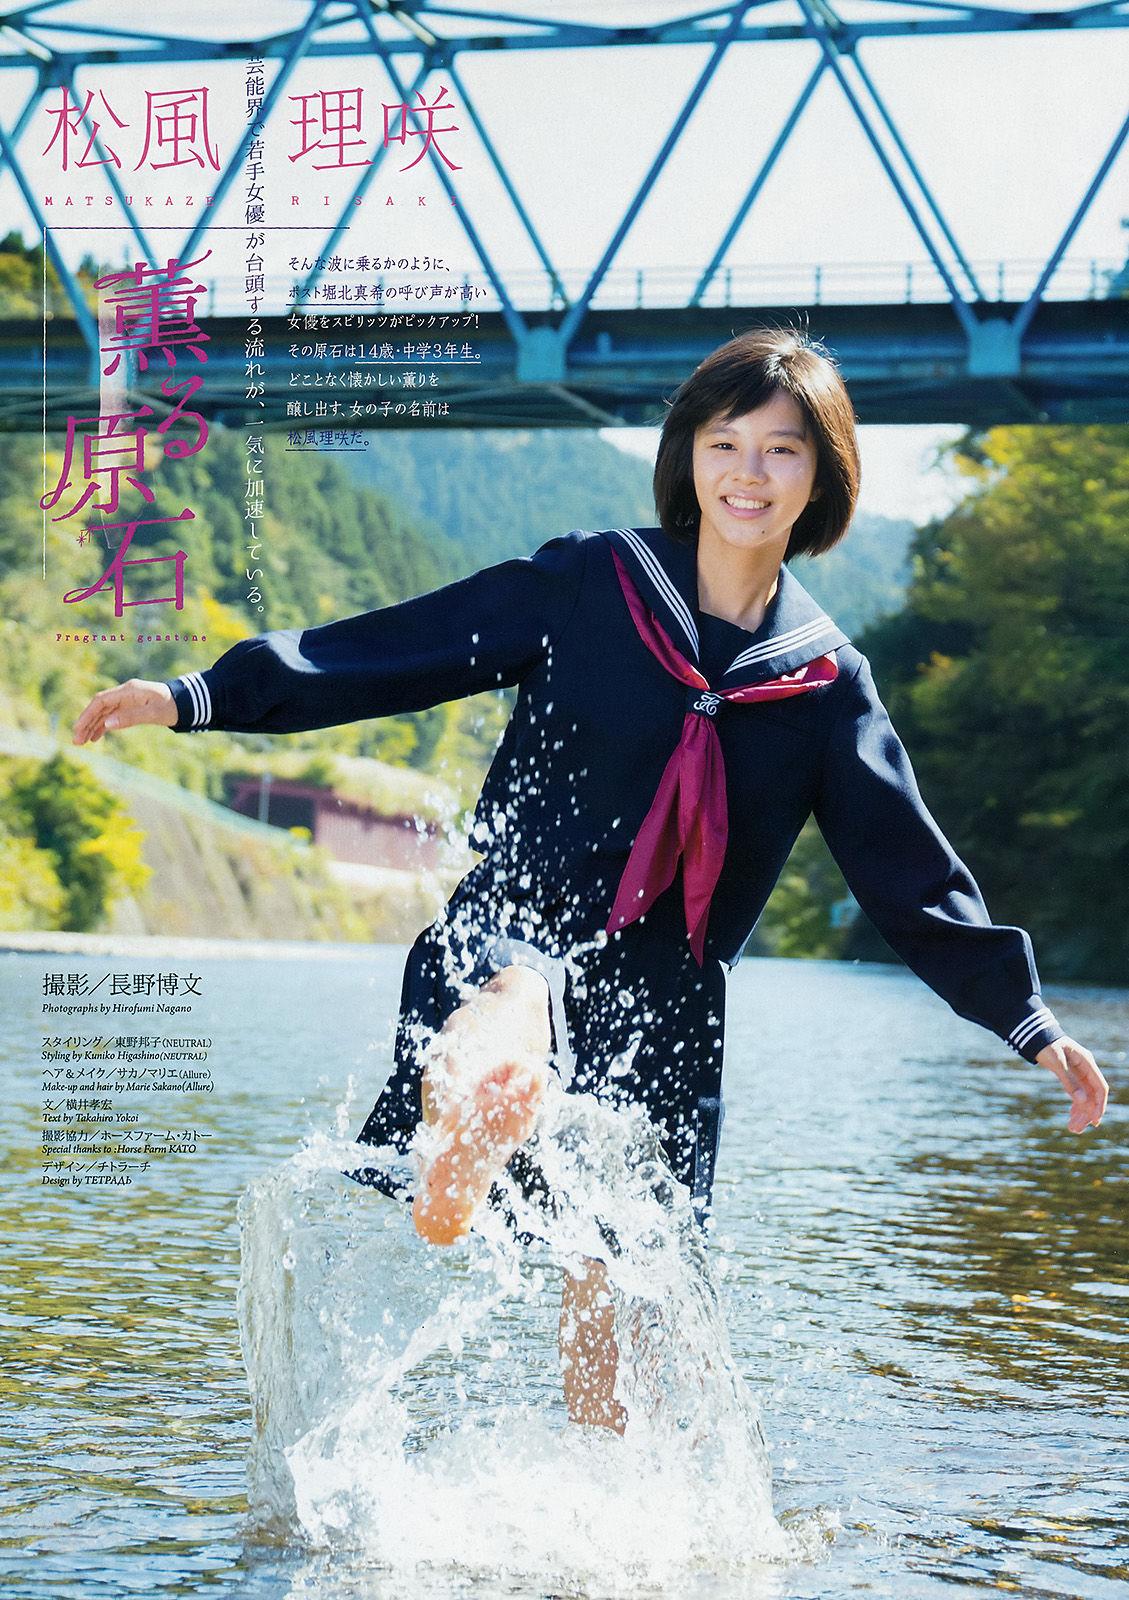 [Weekly Big Comic Spirits杂志写真]松风理咲(松風理咲)超高清写真大图片(7P)|94热度